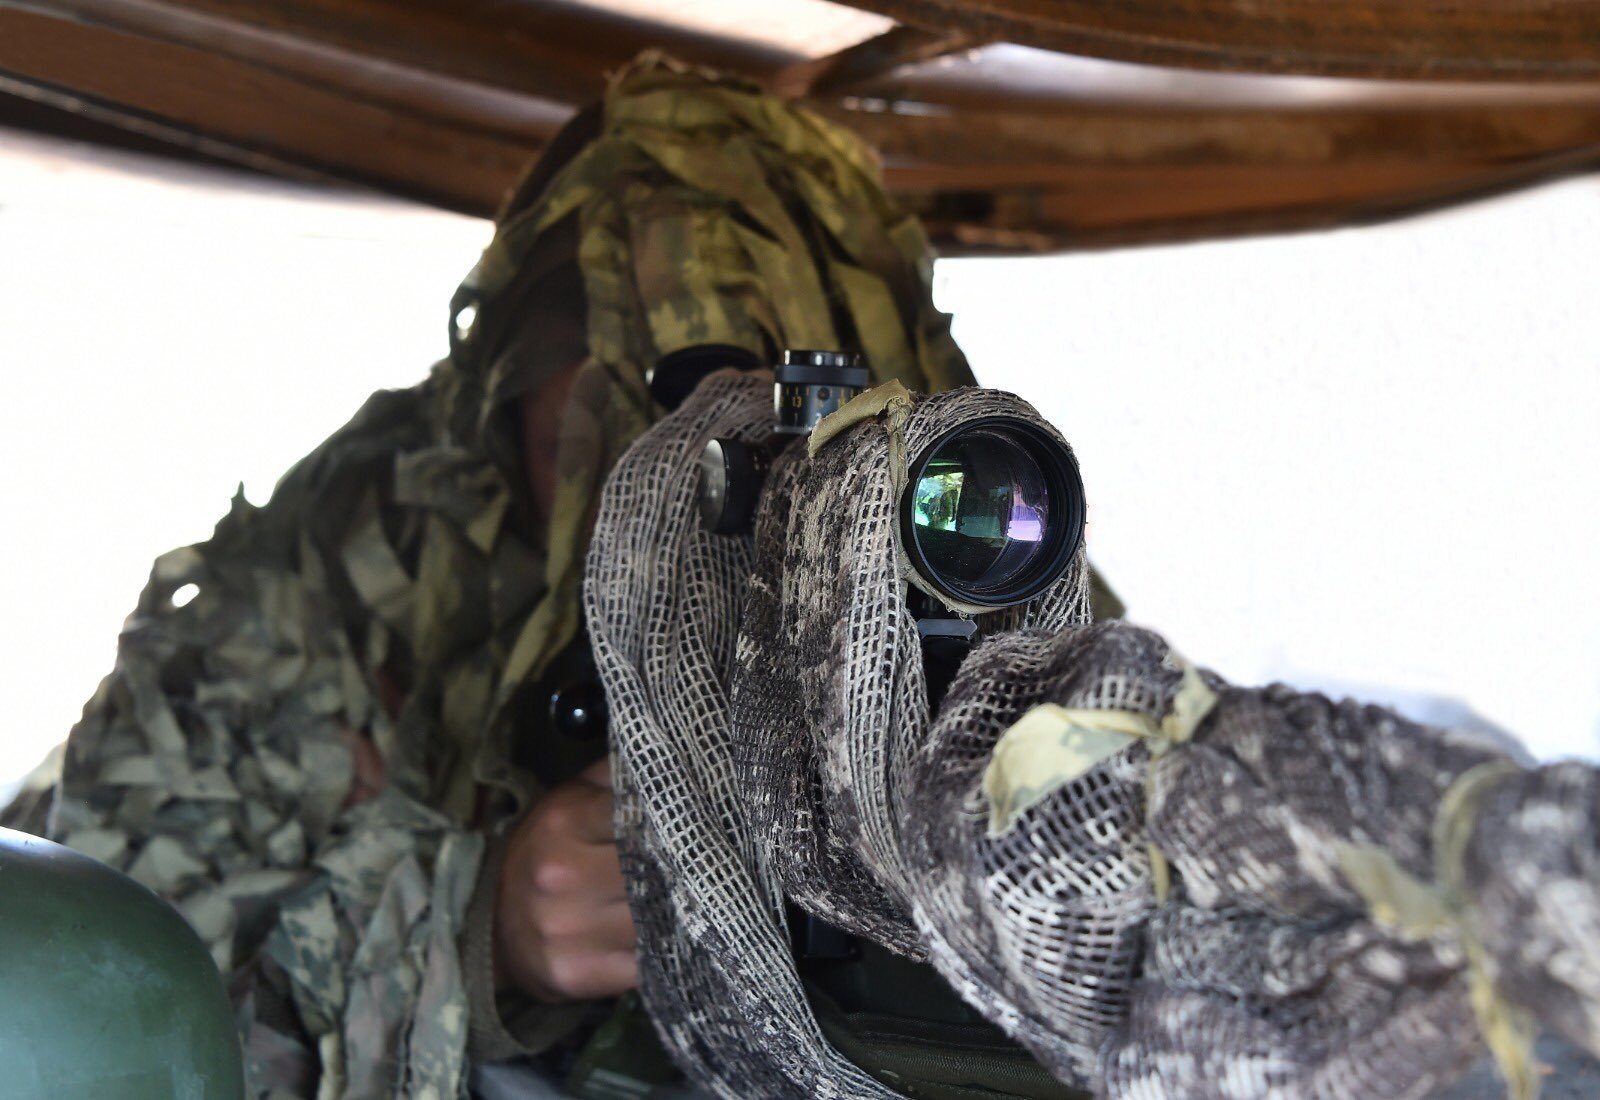 MSB duyurdu: 4 PKK/YPG li terörist yakalandı #1